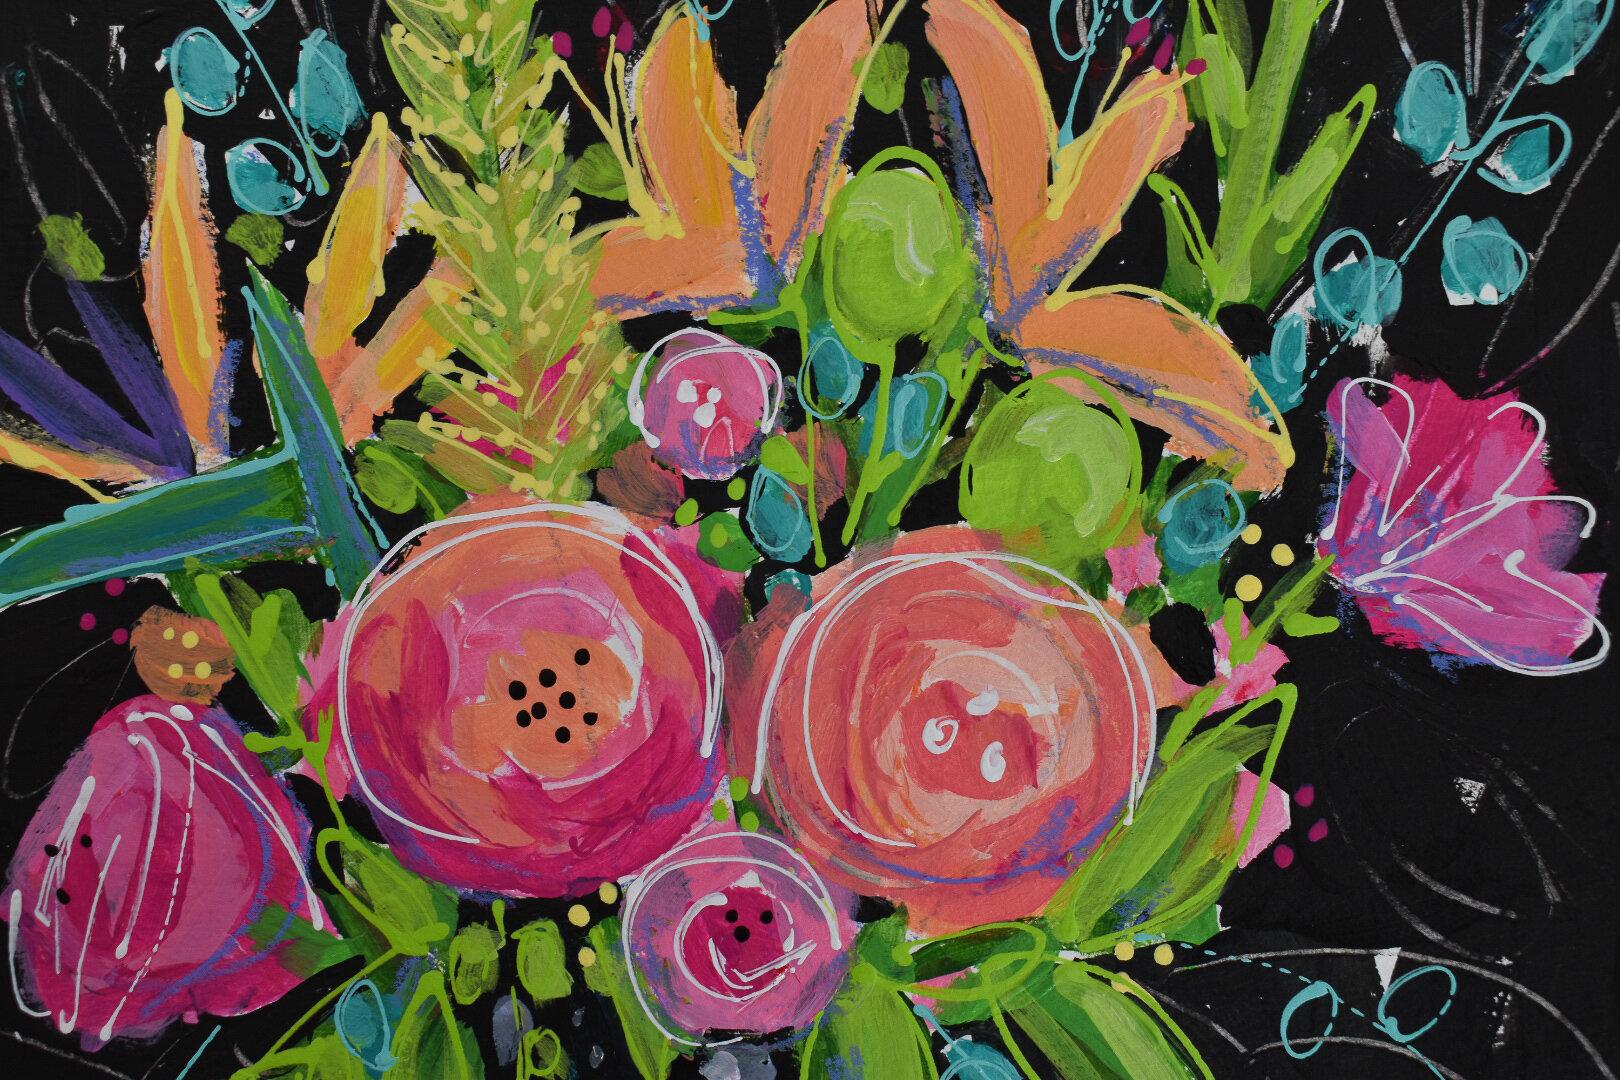 boho_painting_flowers_eclectic_daisyfaithart_6.jpg